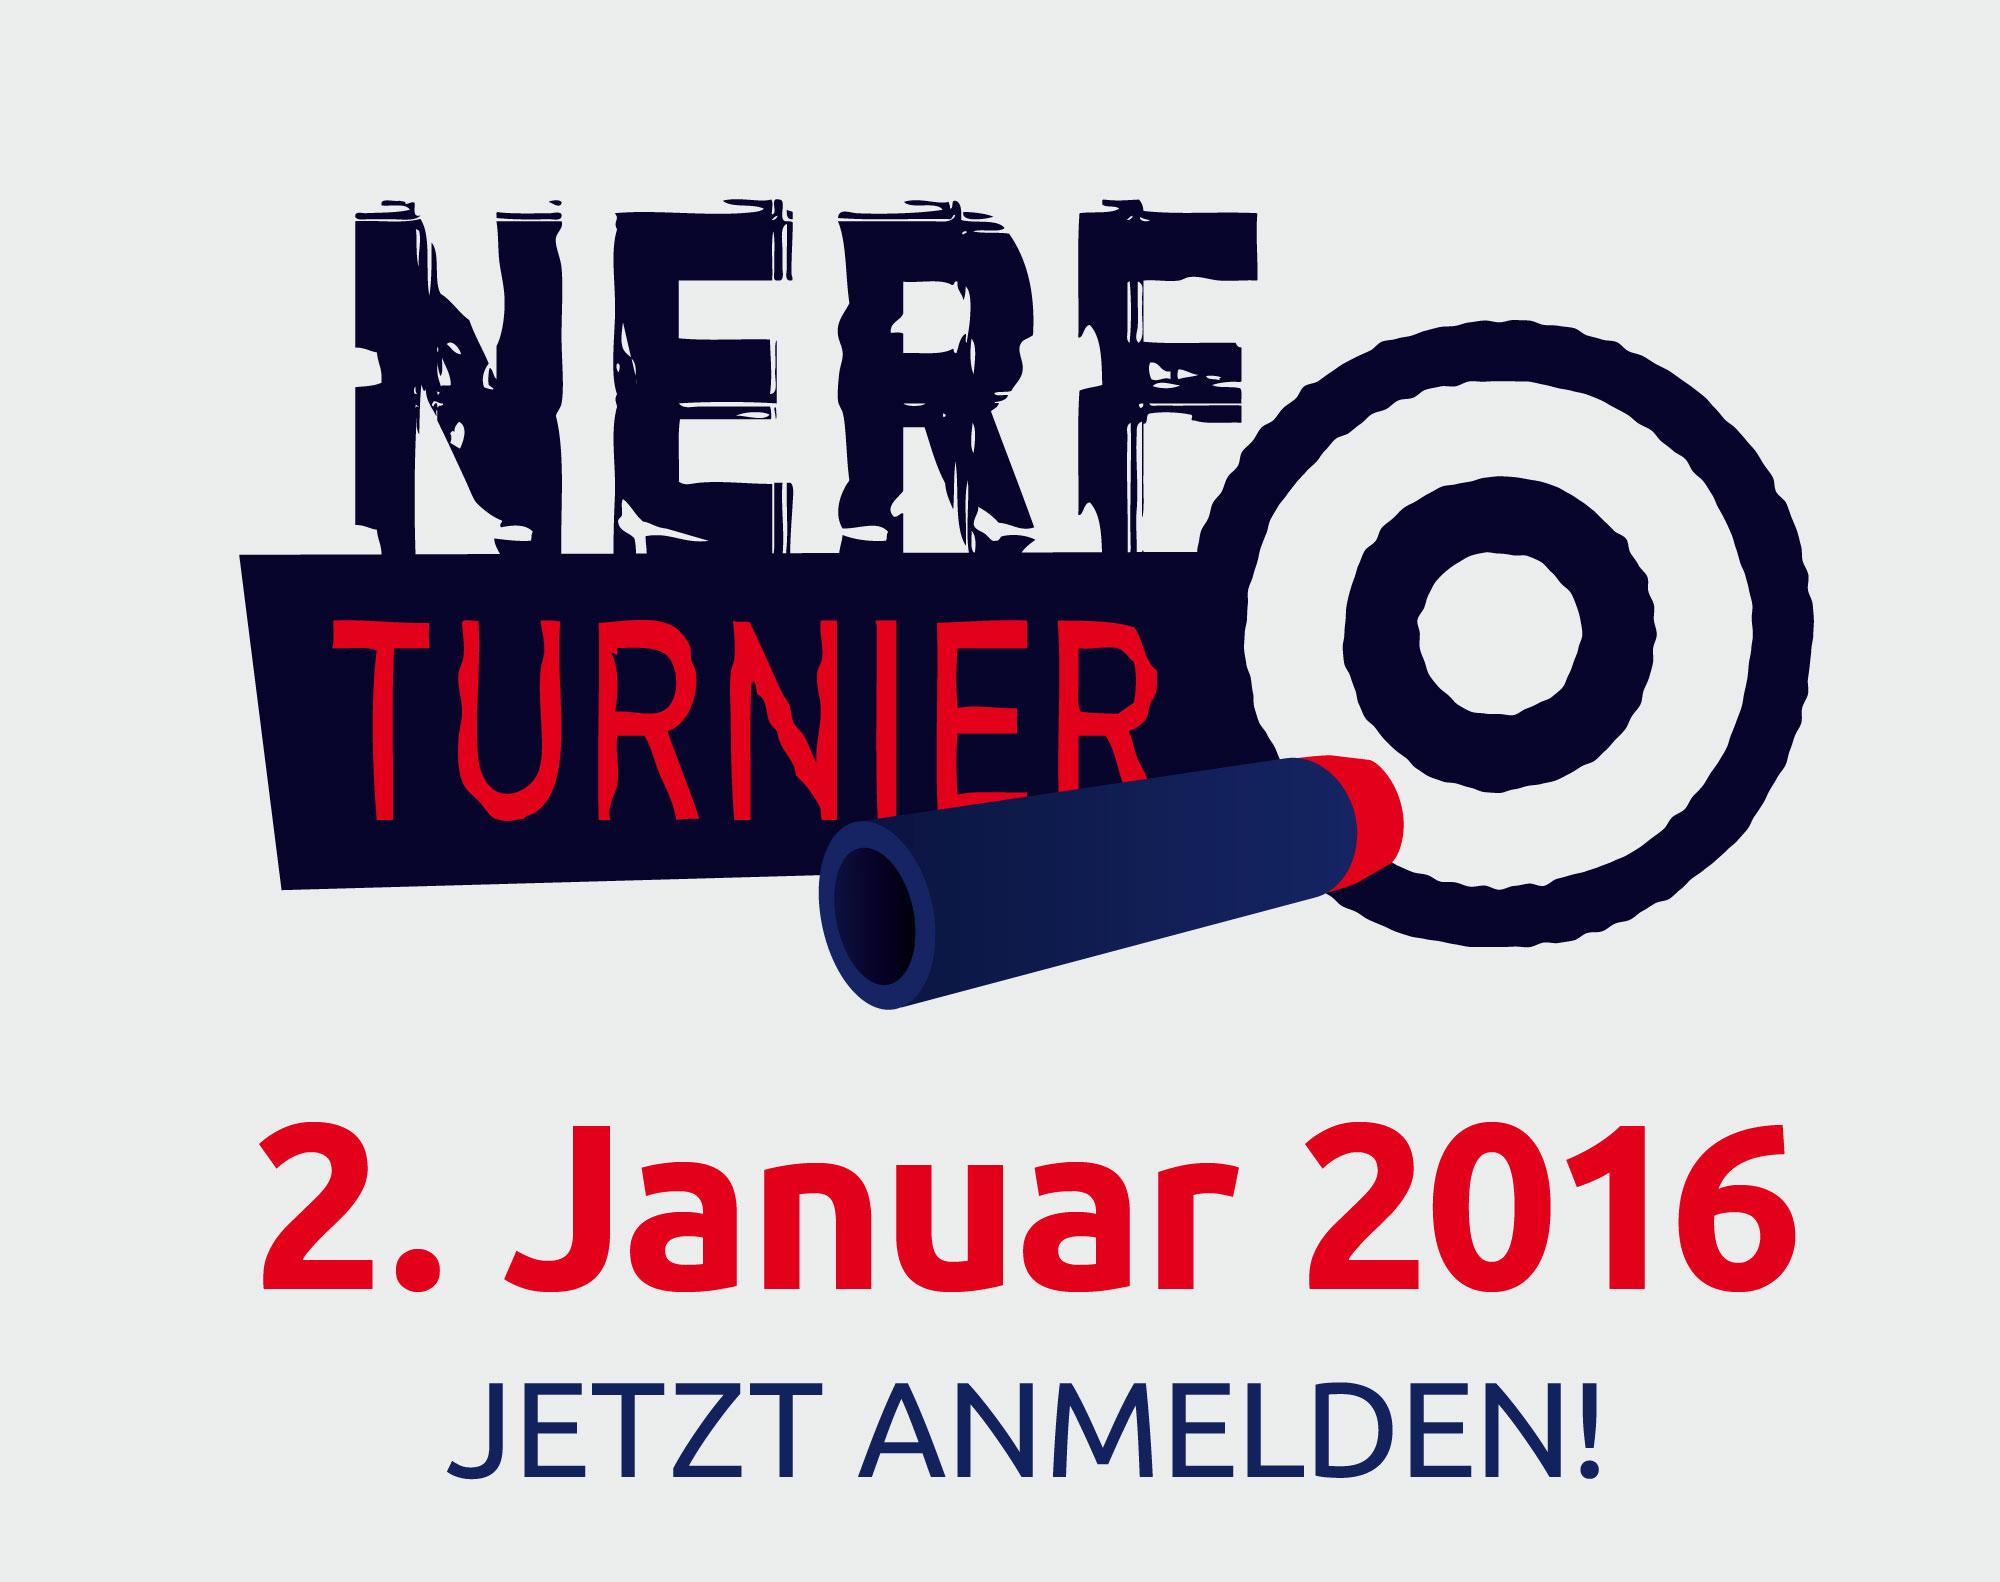 Erster Nerfevent 2016 - Nervent 2. Januar 16